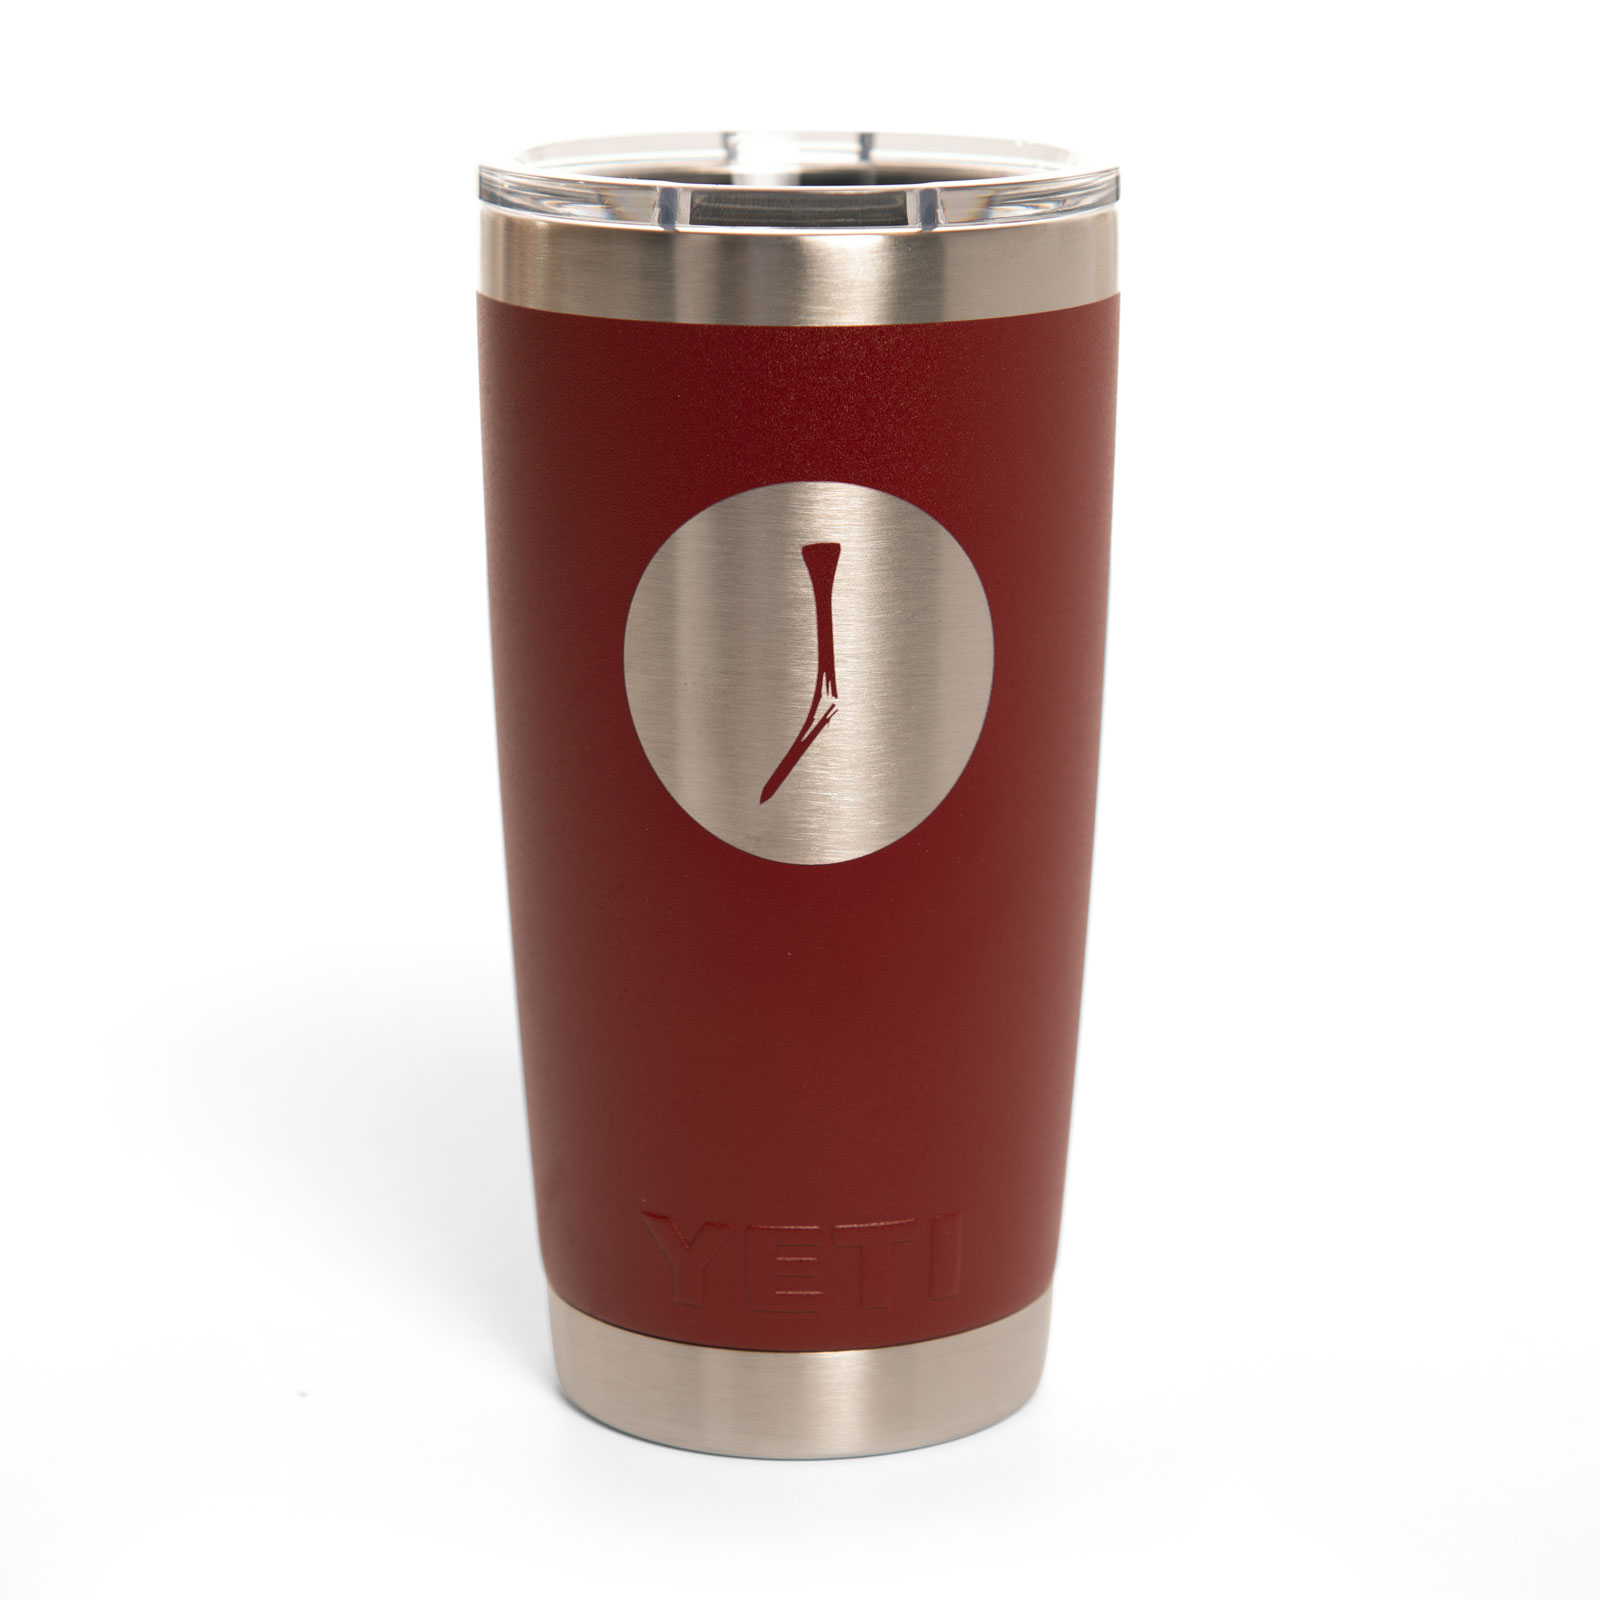 TGJ x Yeti Rambler Cup- Red